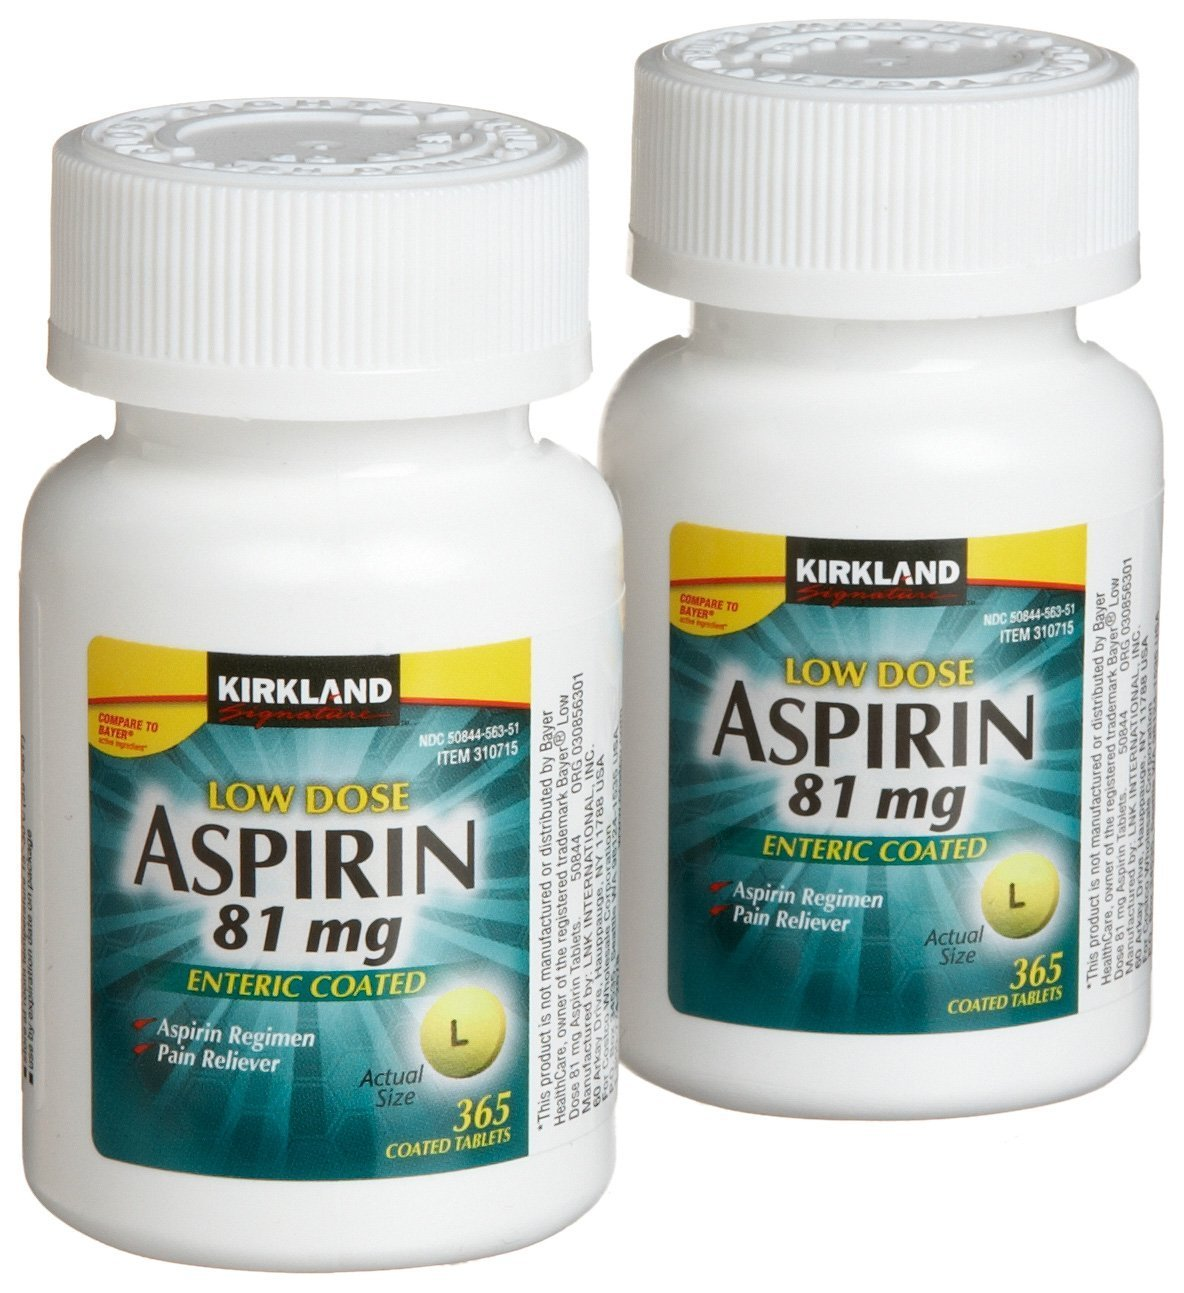 Kirkland Signature Low Dose Aspirin, 4 bottles - 365-Count Enteric Coated Tablets 81 mg each (1460 Tablets Total)